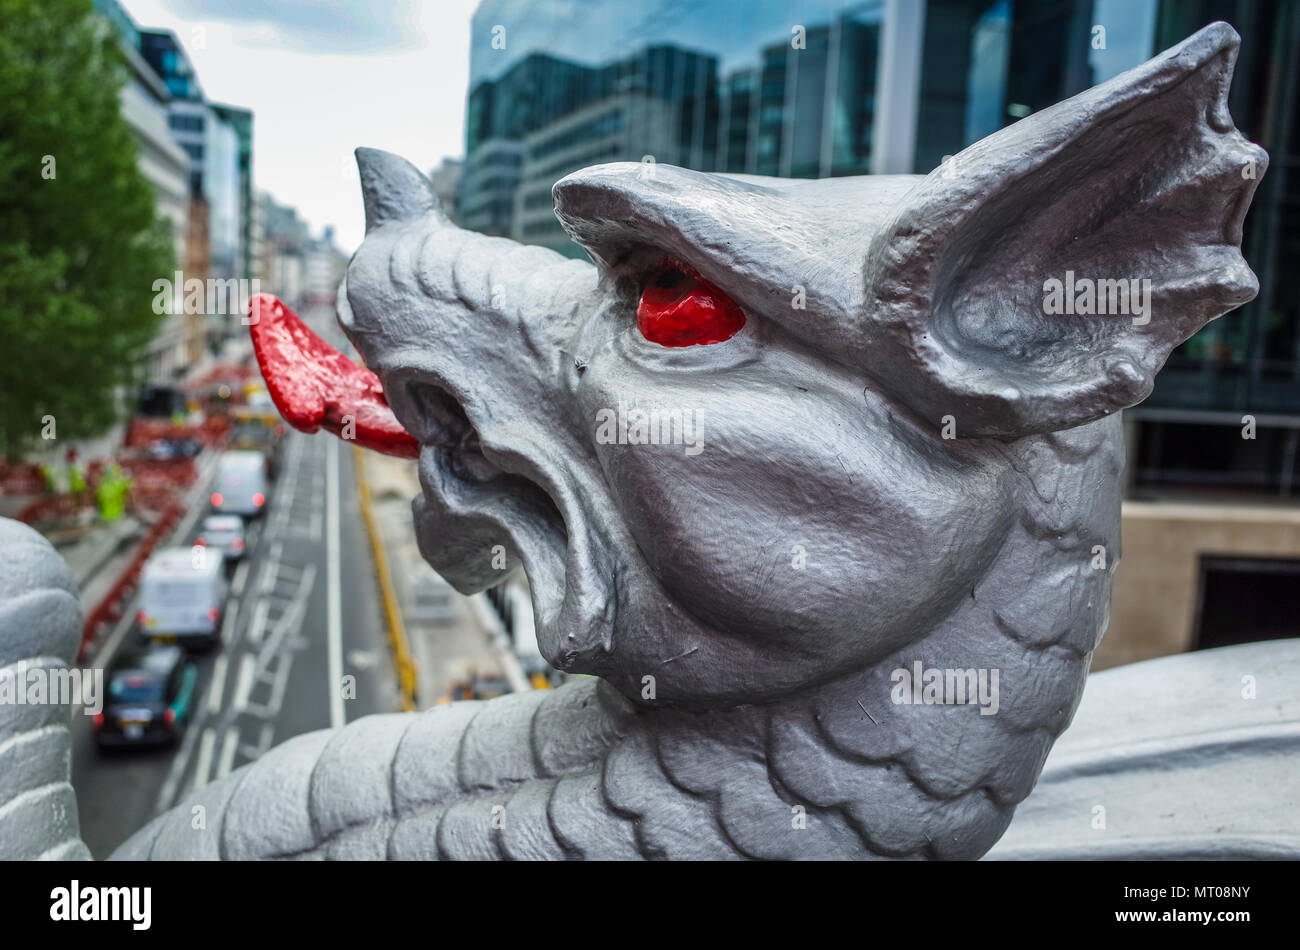 London Dragon - City of London (Square Mile) Boundary Marker Dragon on Holborn Viaduct - Stock Image